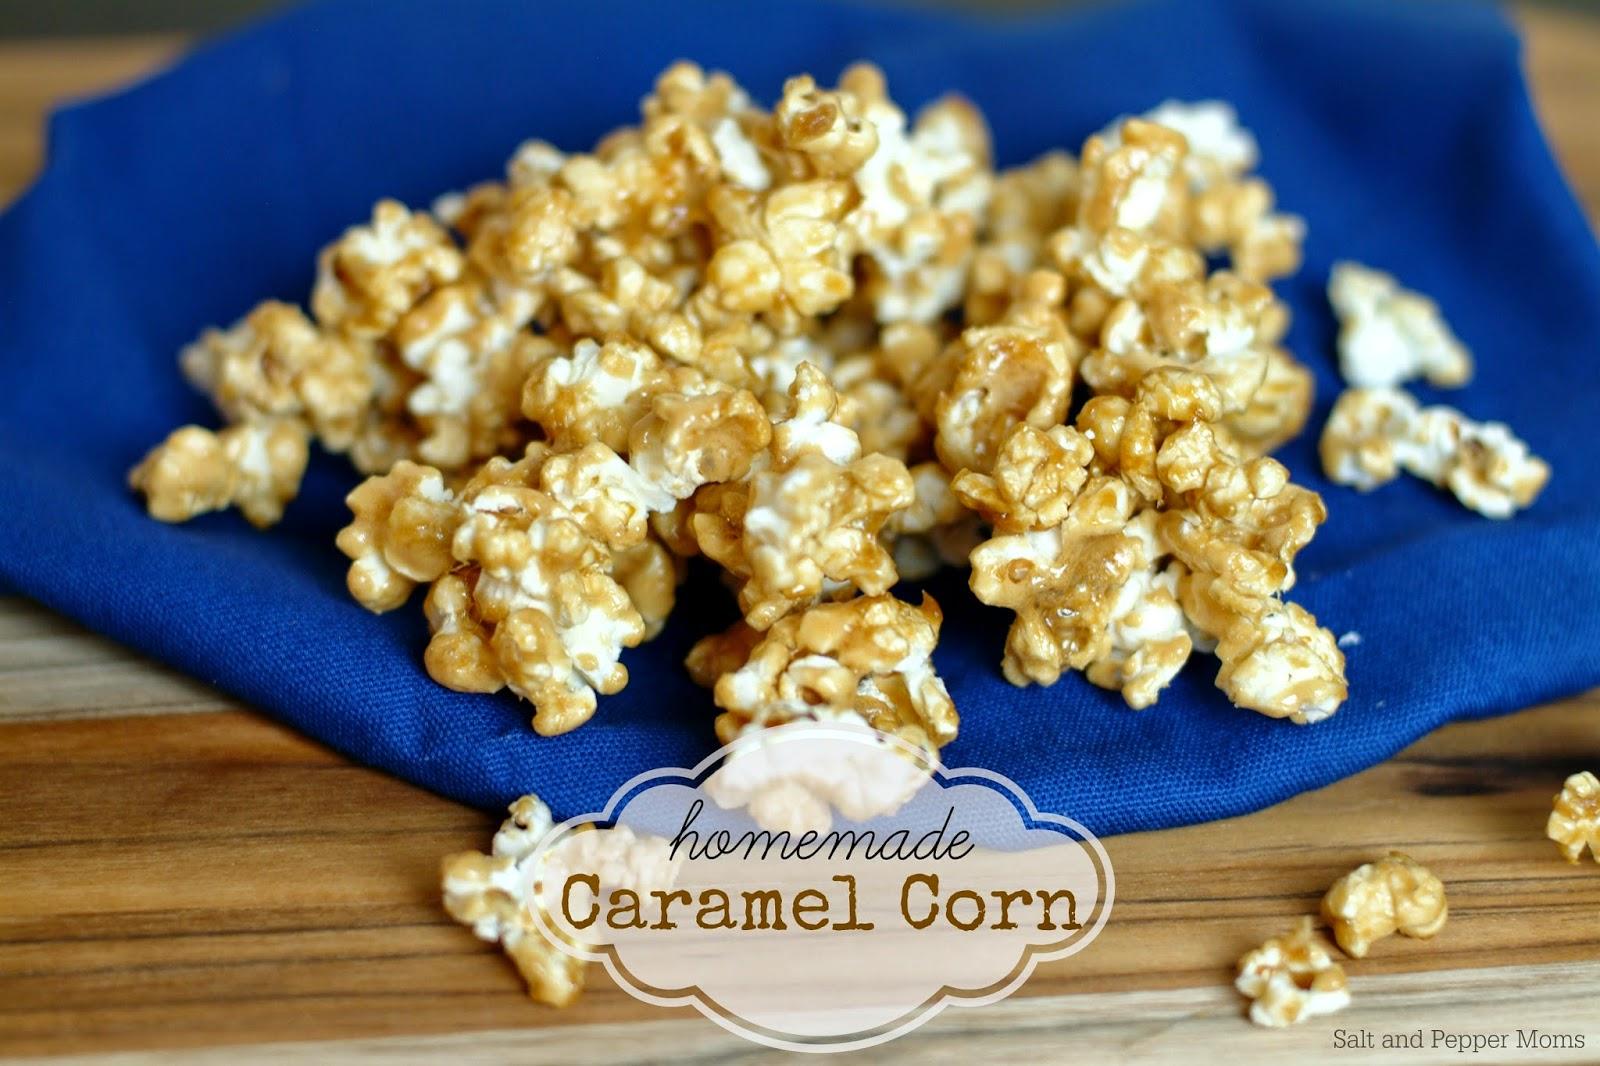 http://saltandpeppermoms.blogspot.com/2014/06/homemade-caramel-corn.html